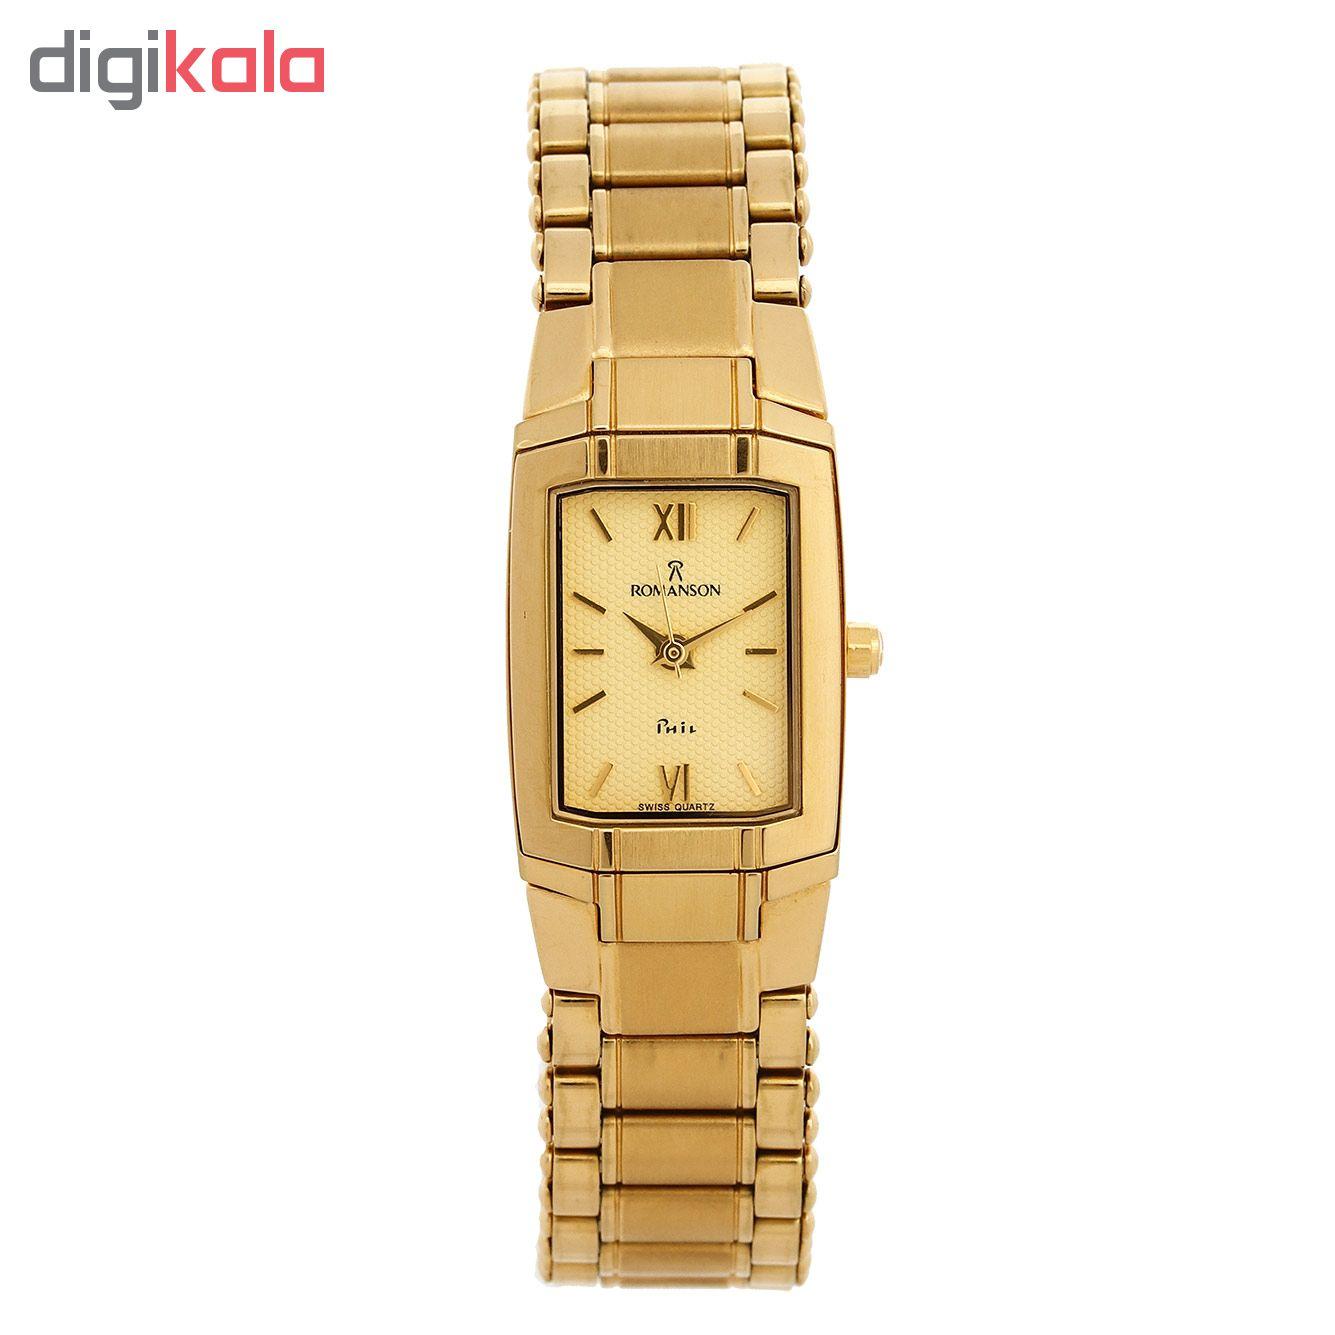 ساعت زنانه برند رومانسون مدل NM6506LL1GA81G